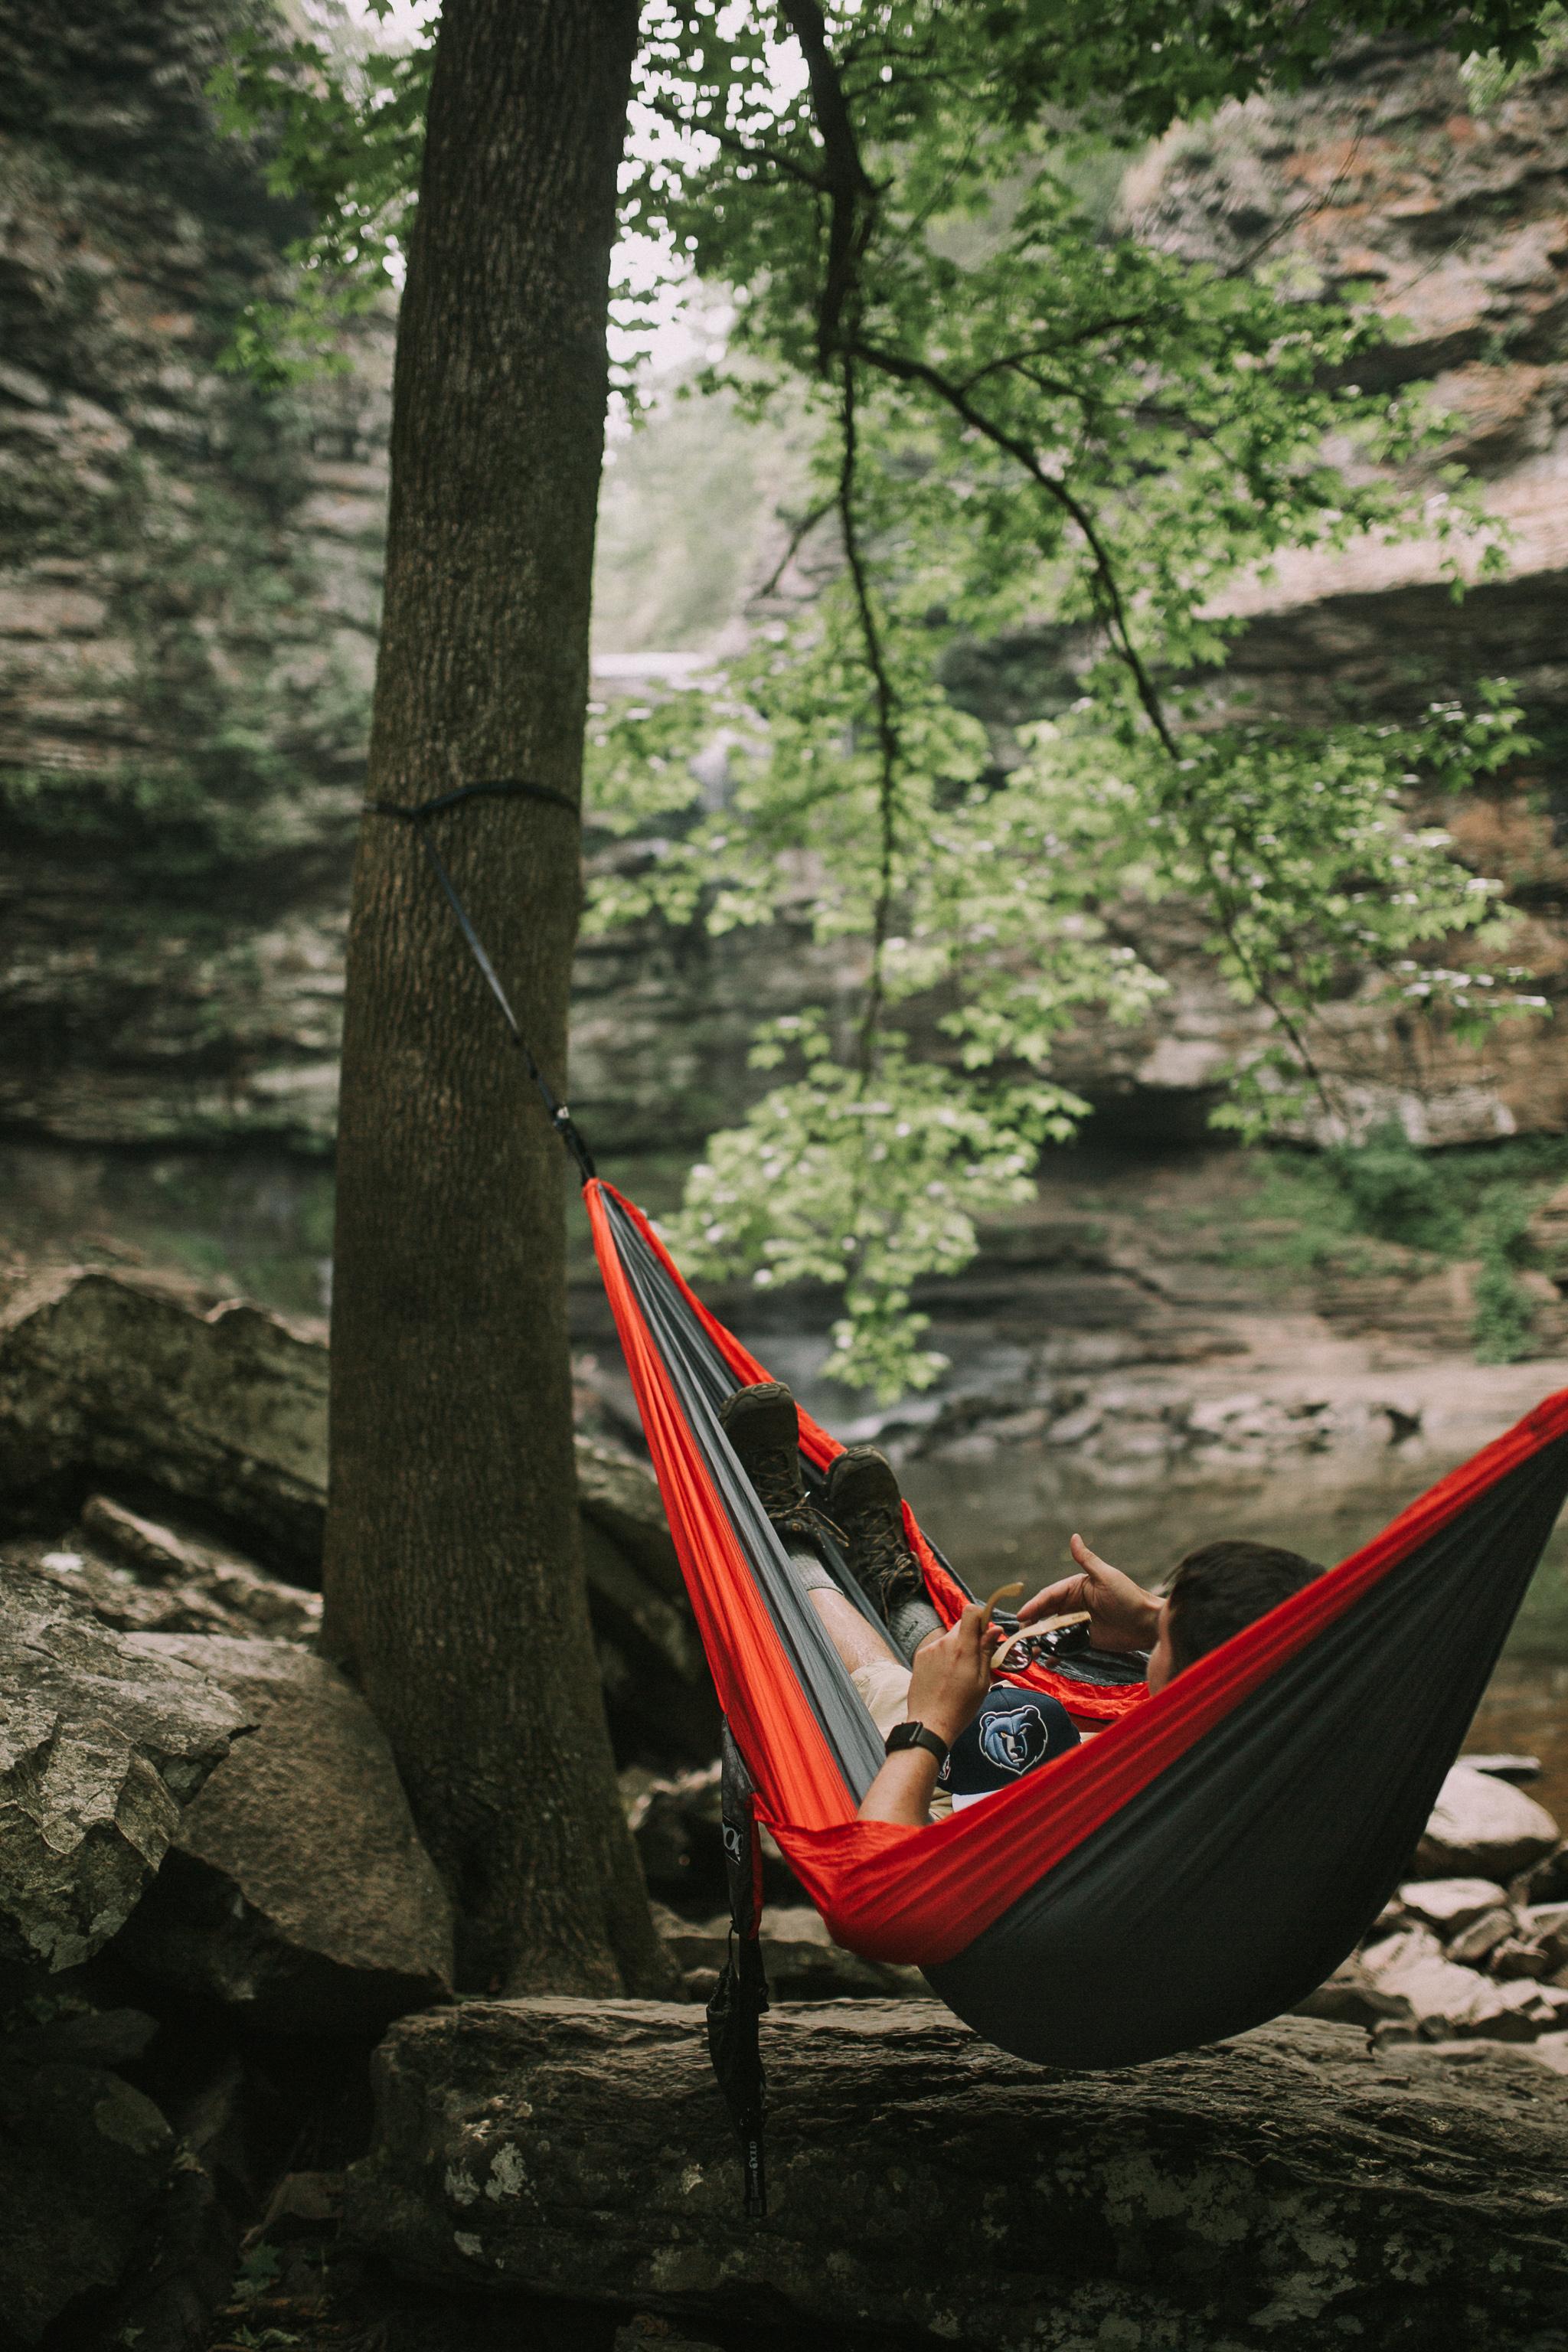 cassie-cook-photography-destination-photographer-petit-jean-state-park-cedar-falls